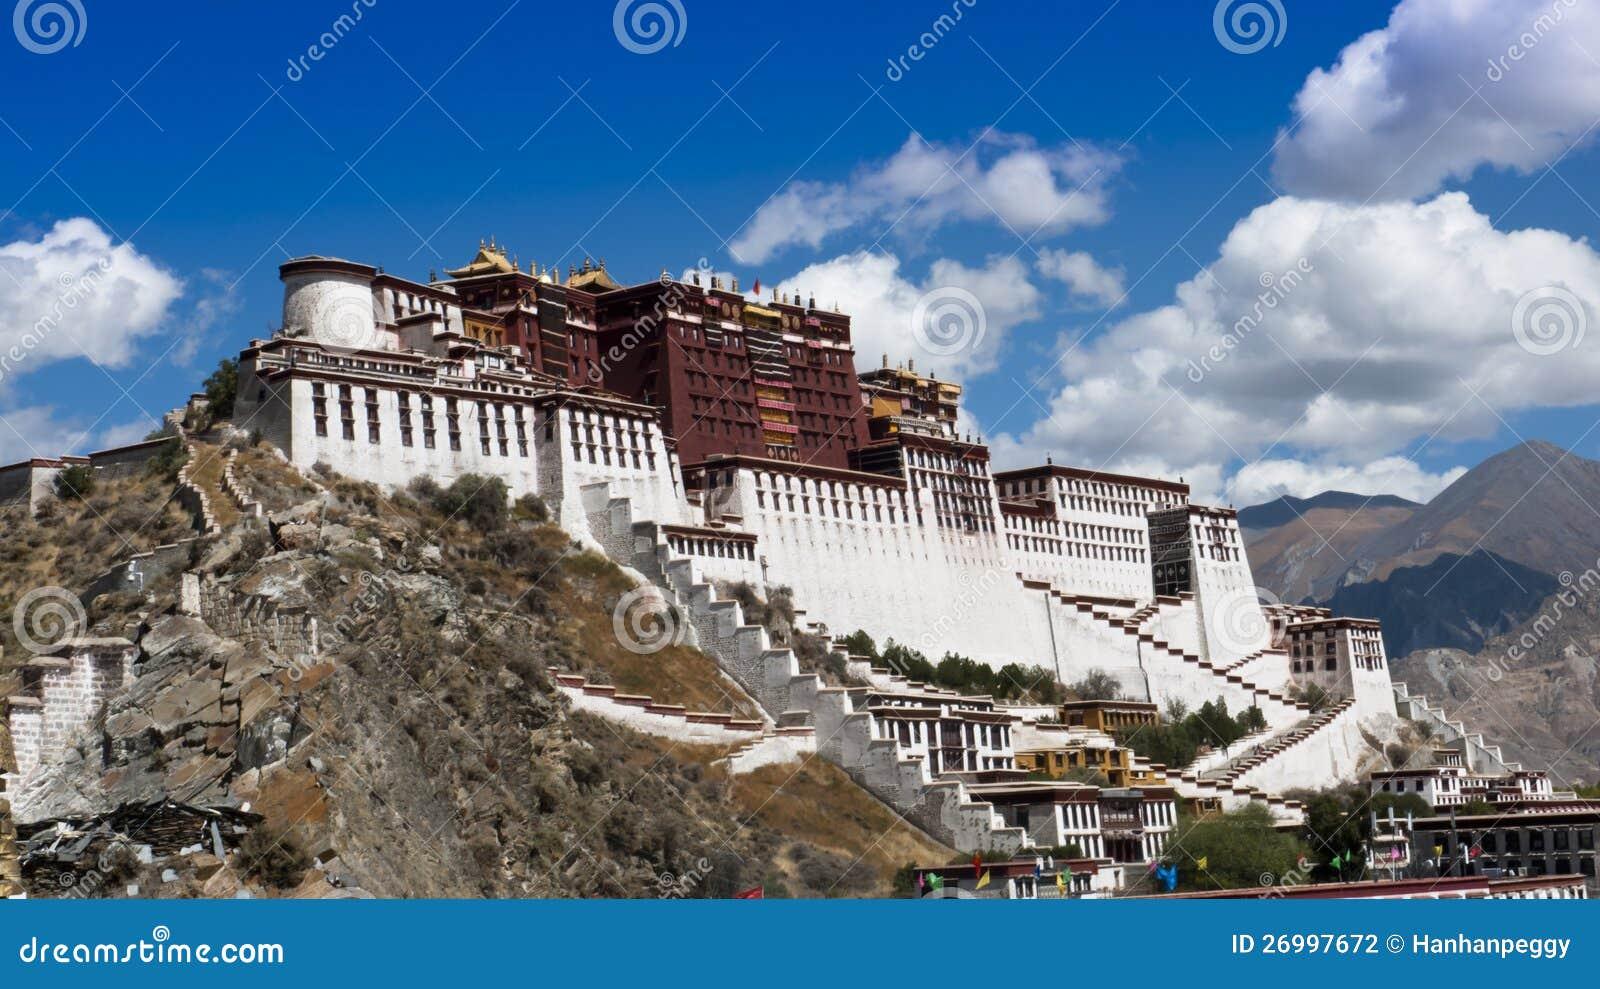 Tibet landmark